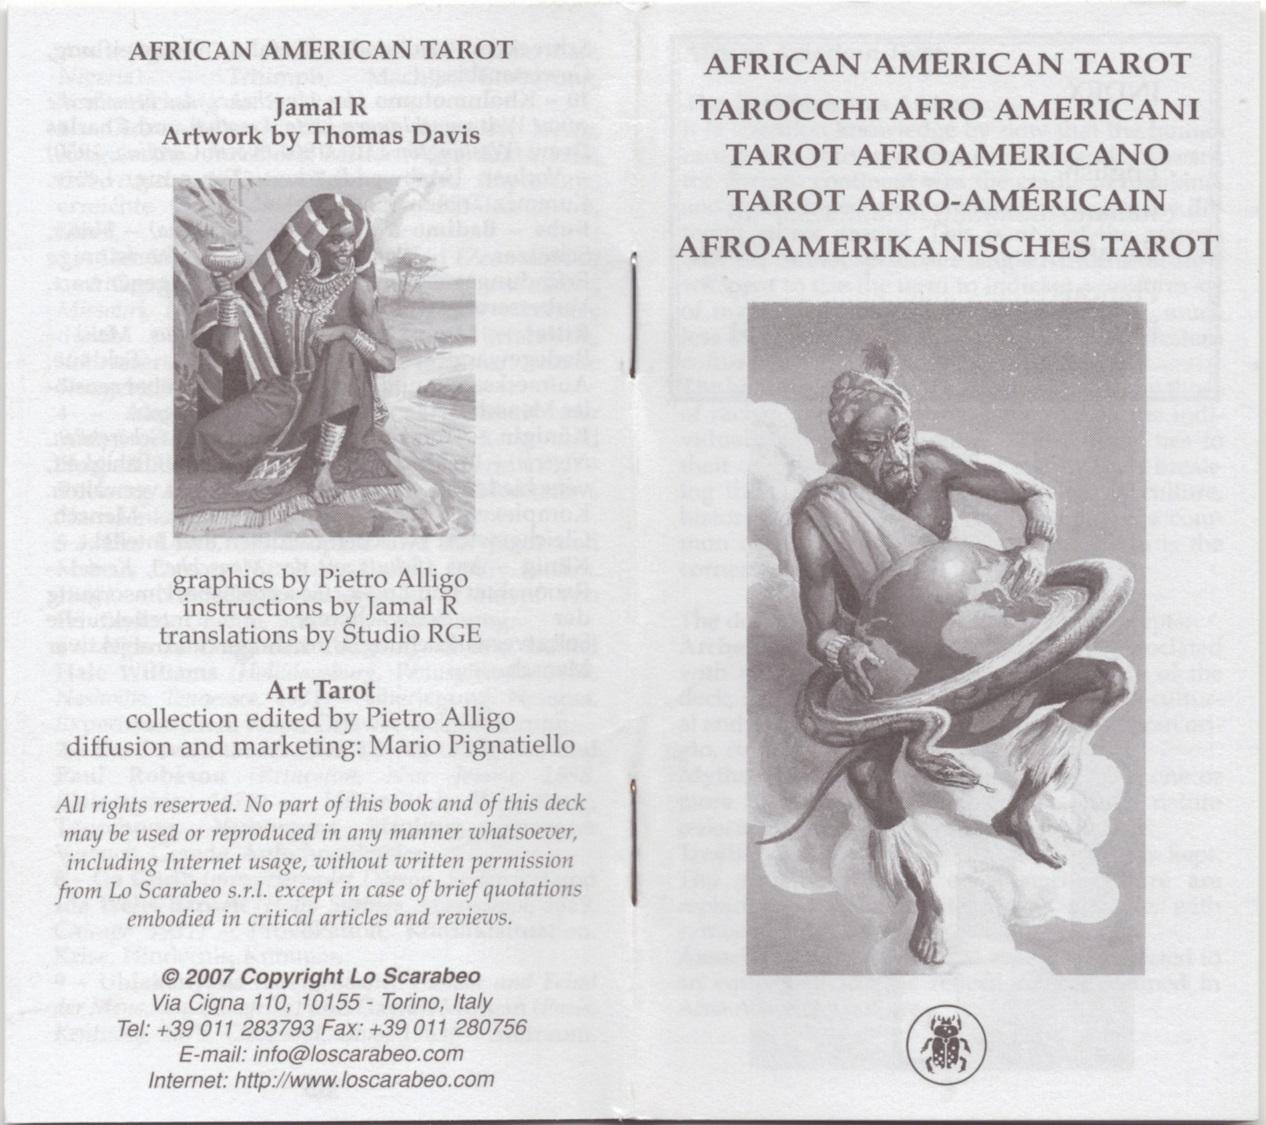 AfricanAmerican_LWB.jpg